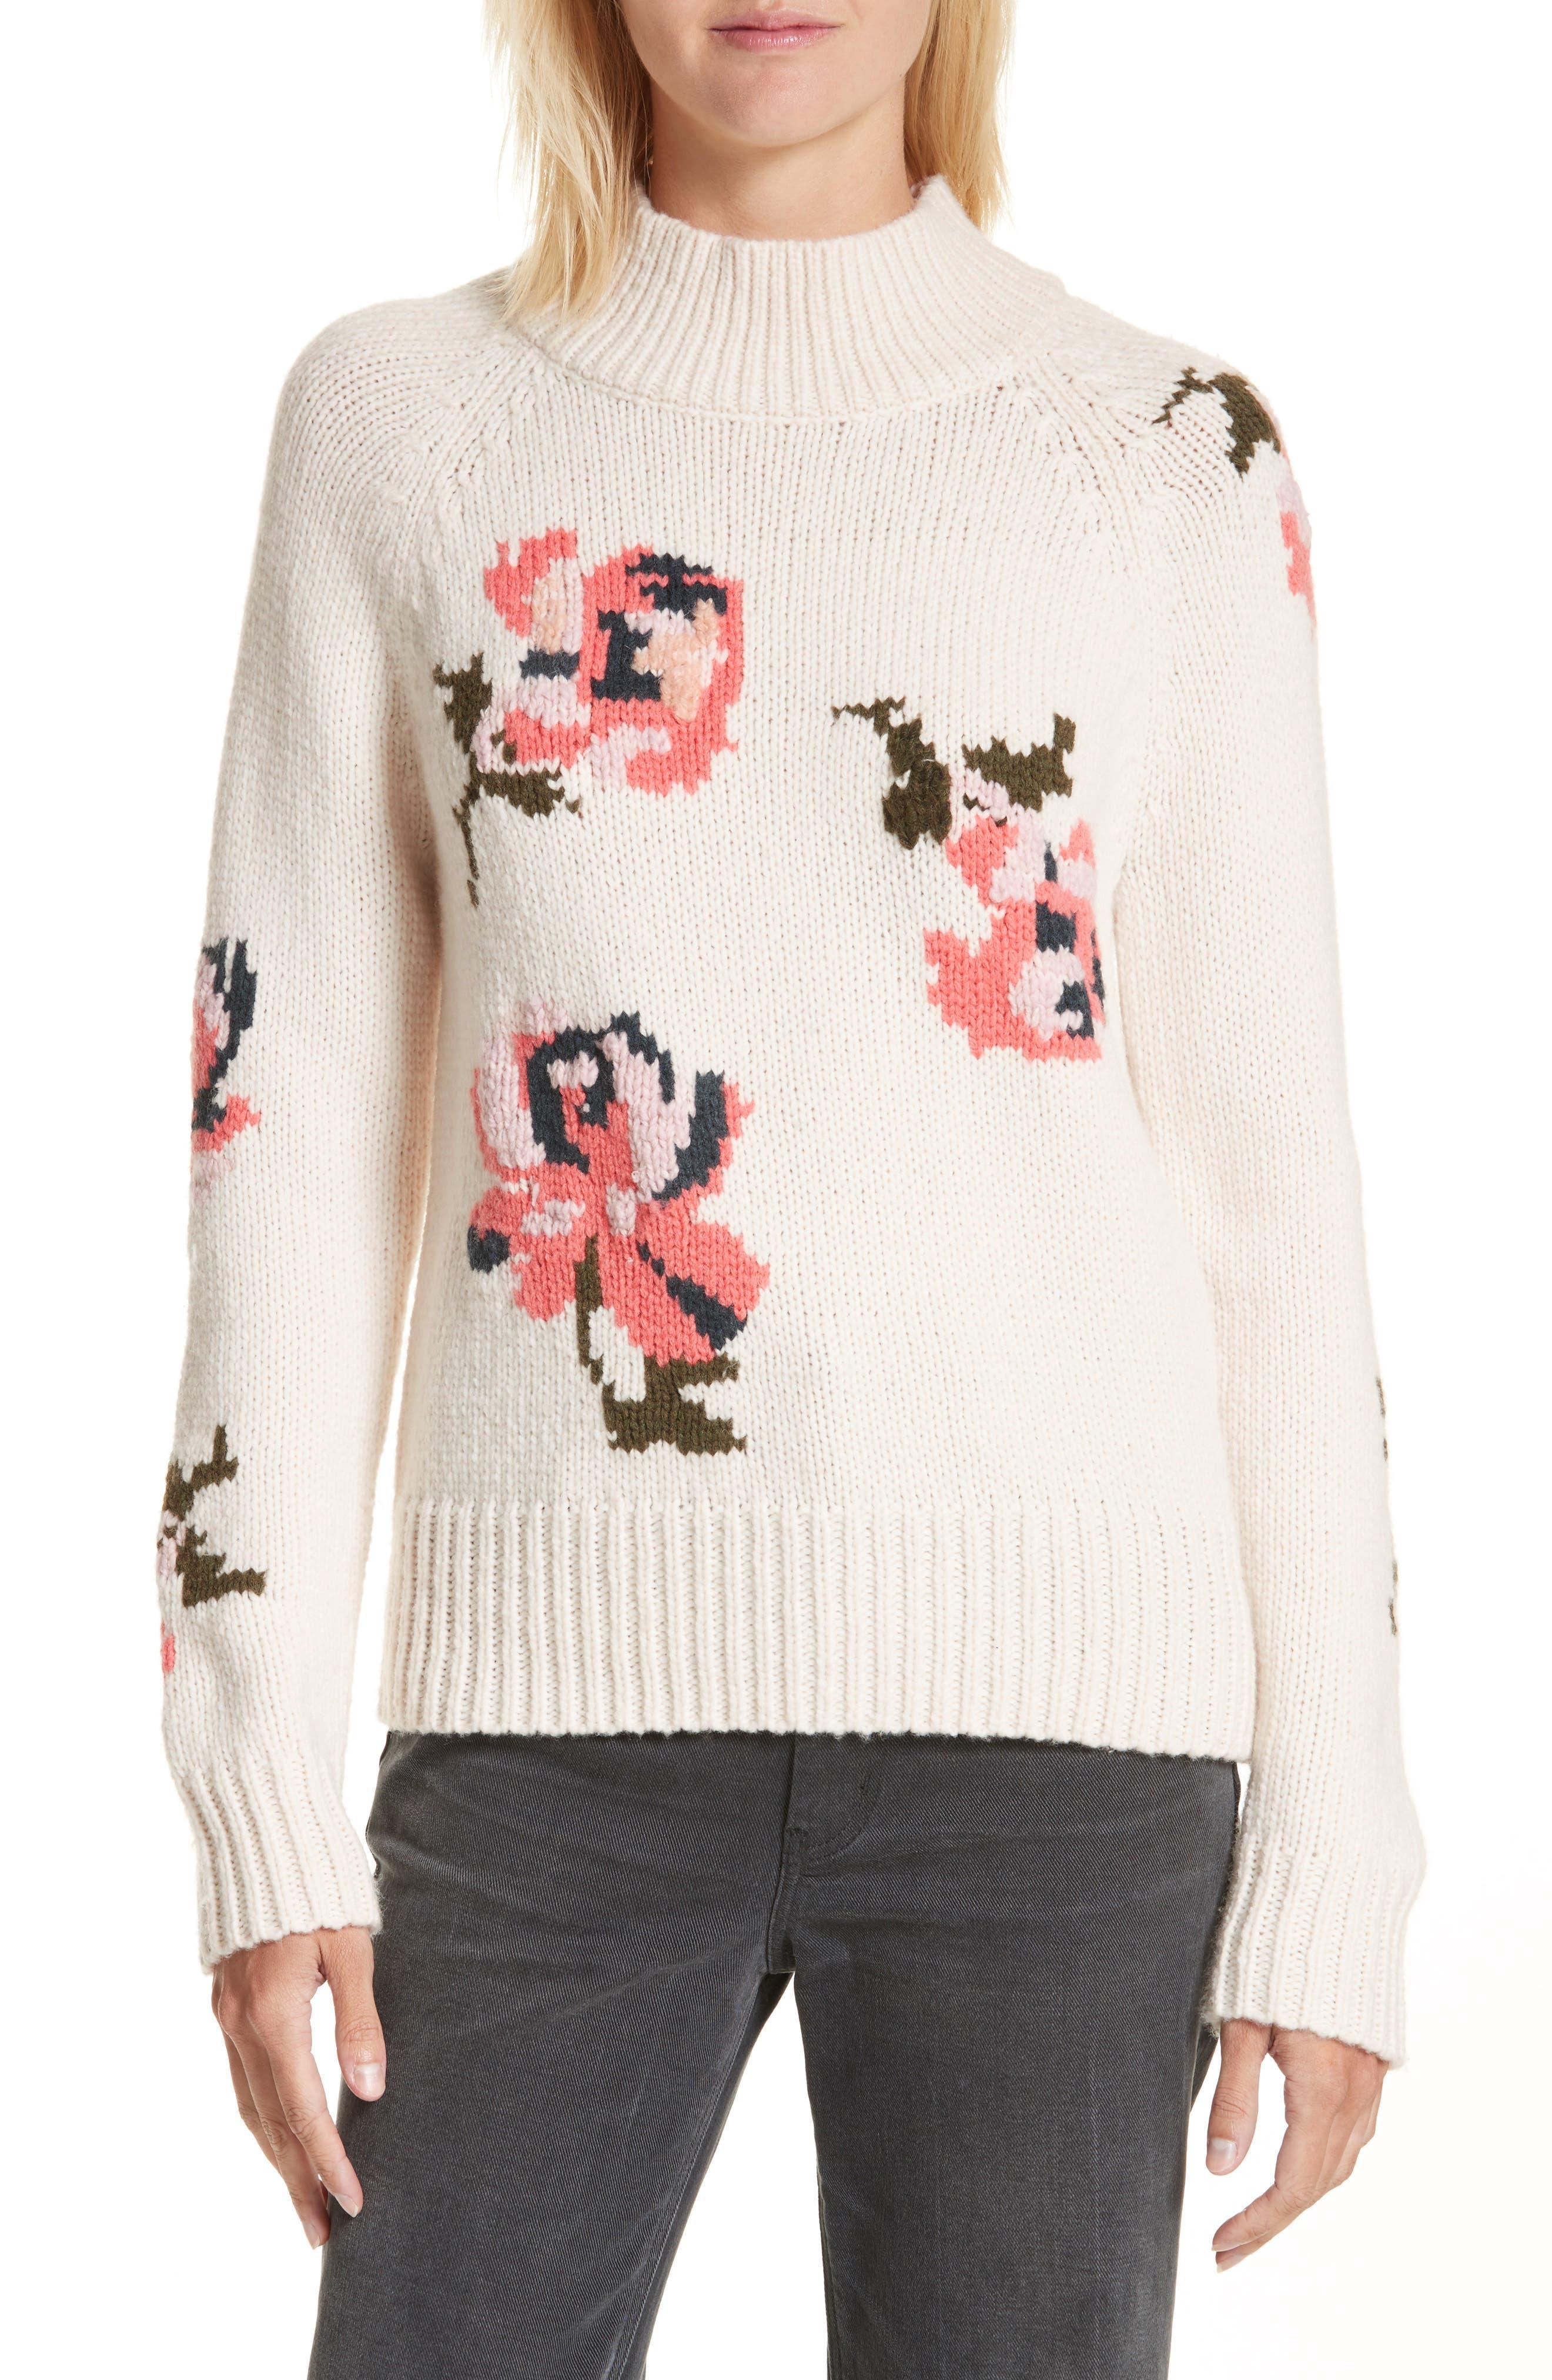 Rebecca Taylor Intarsia Floral Knit Sweater